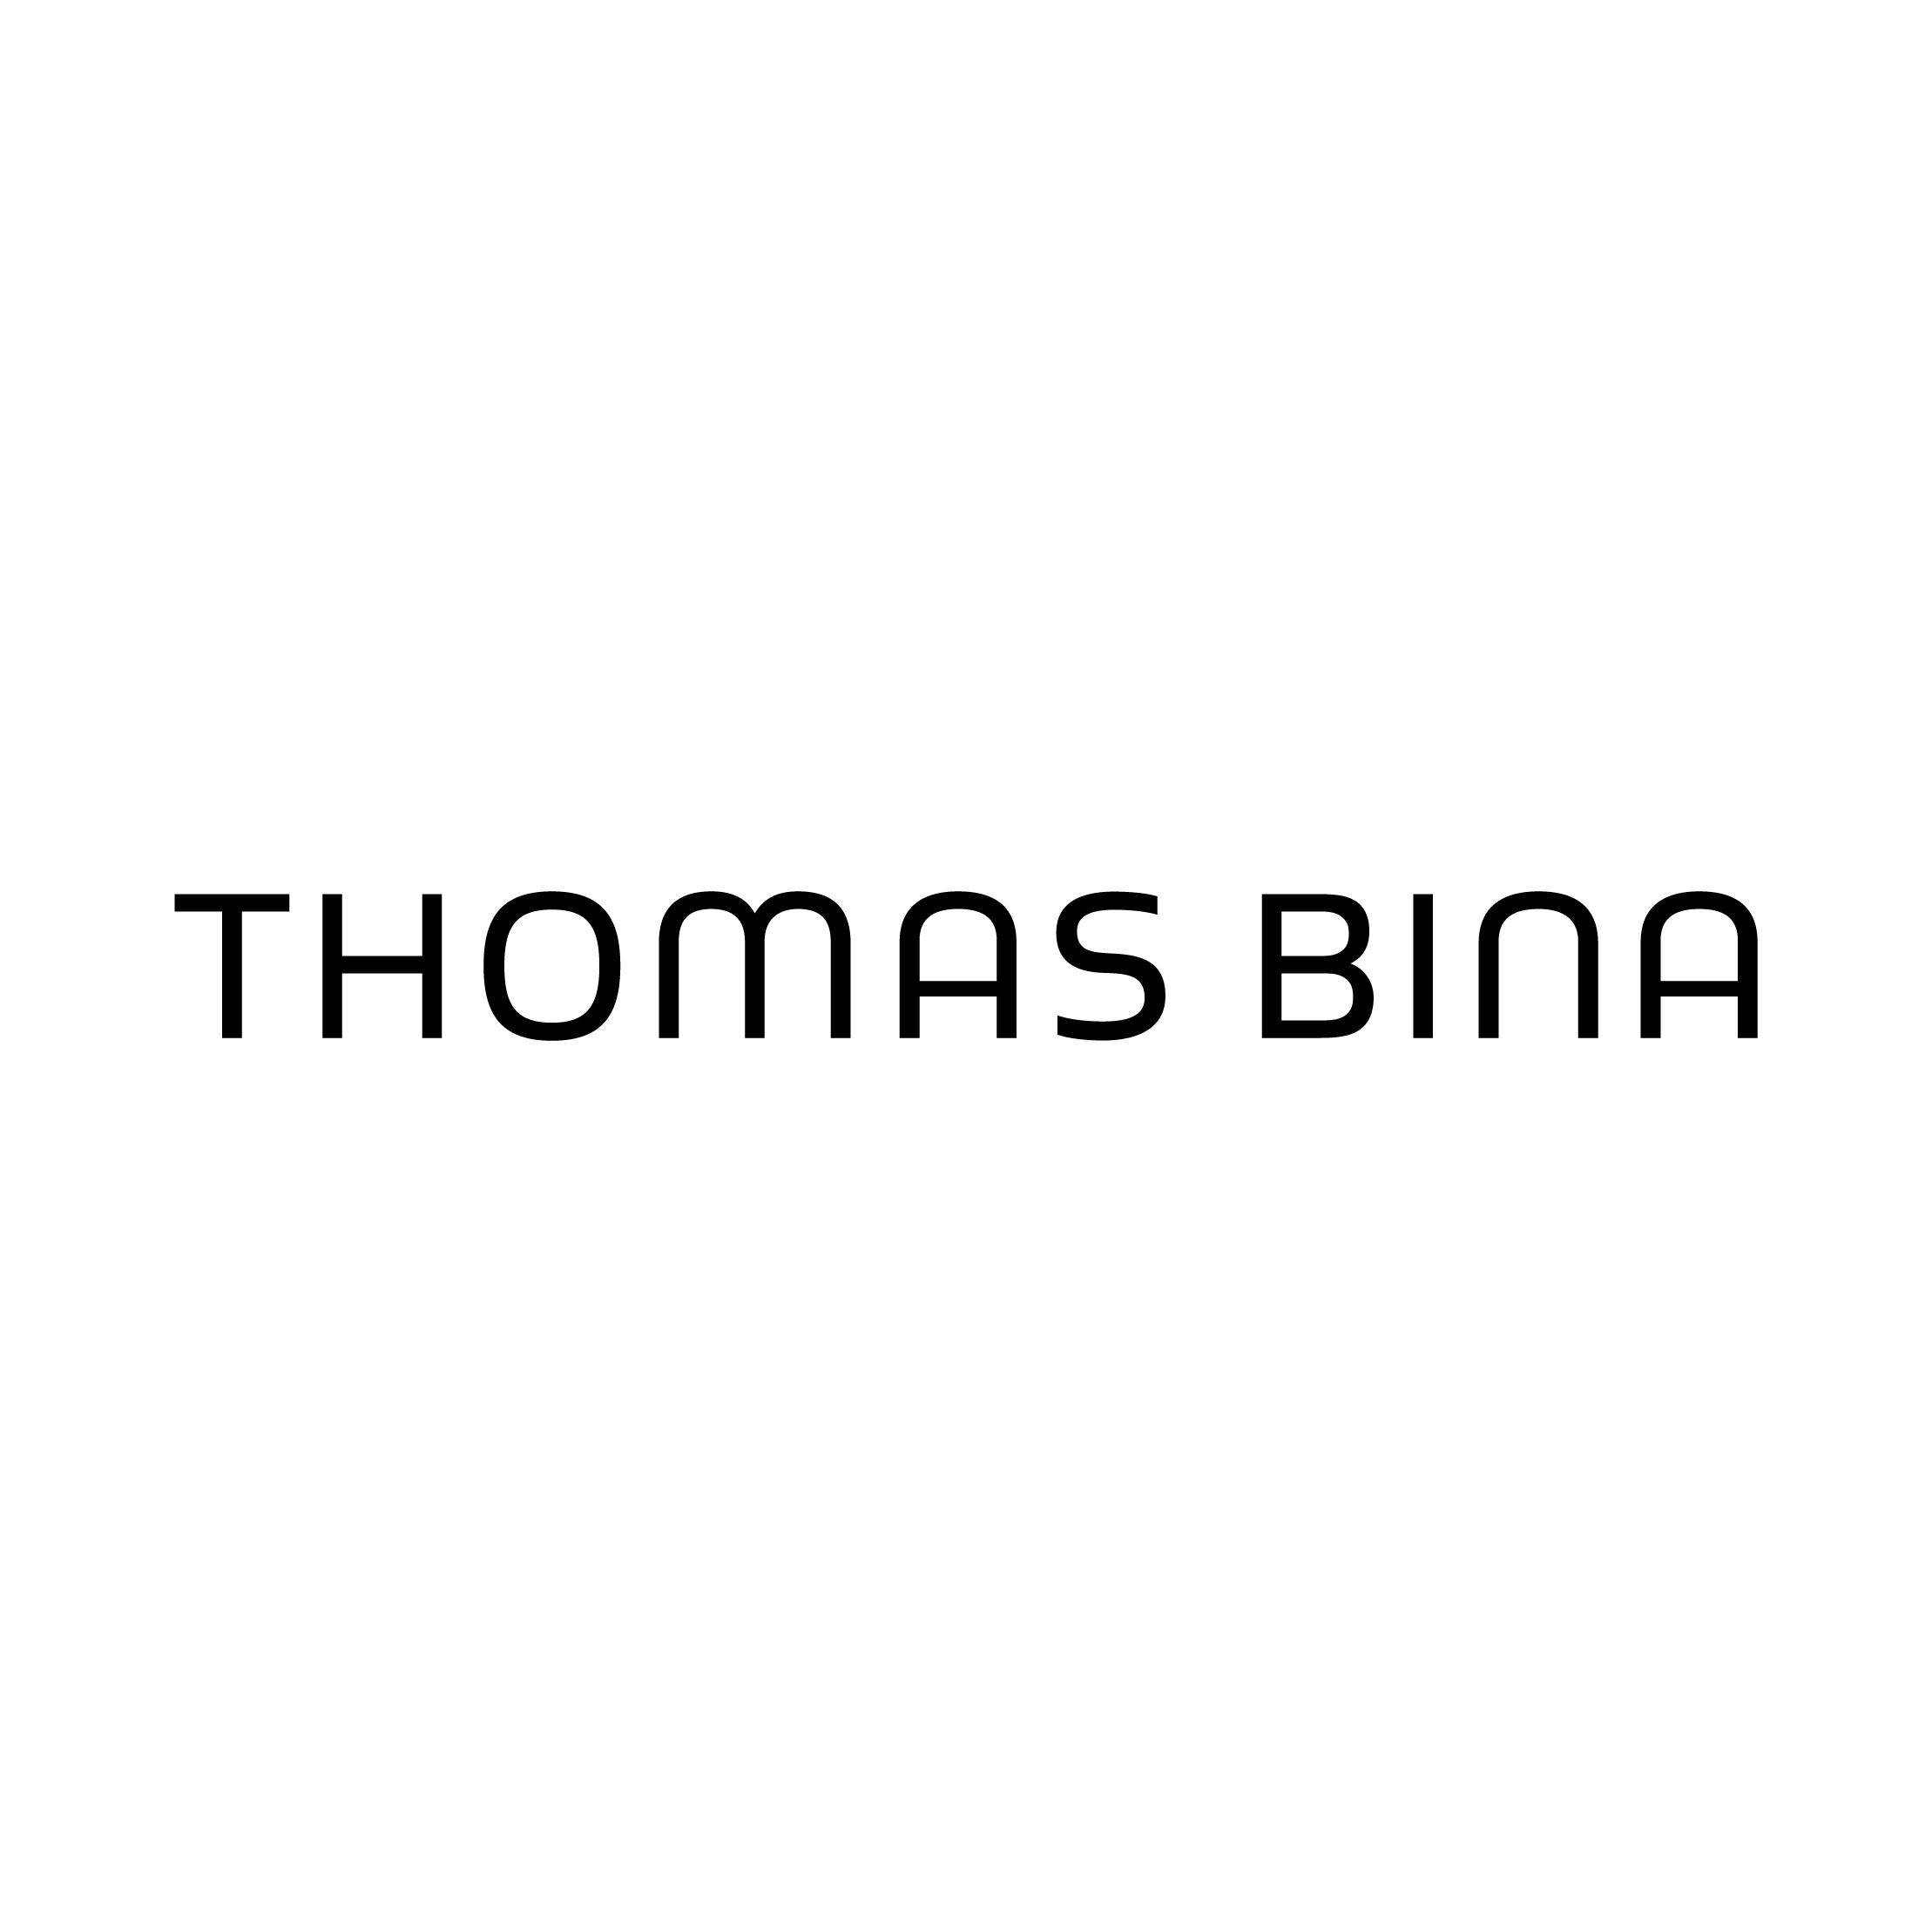 Thomas Bina black-03.jpg